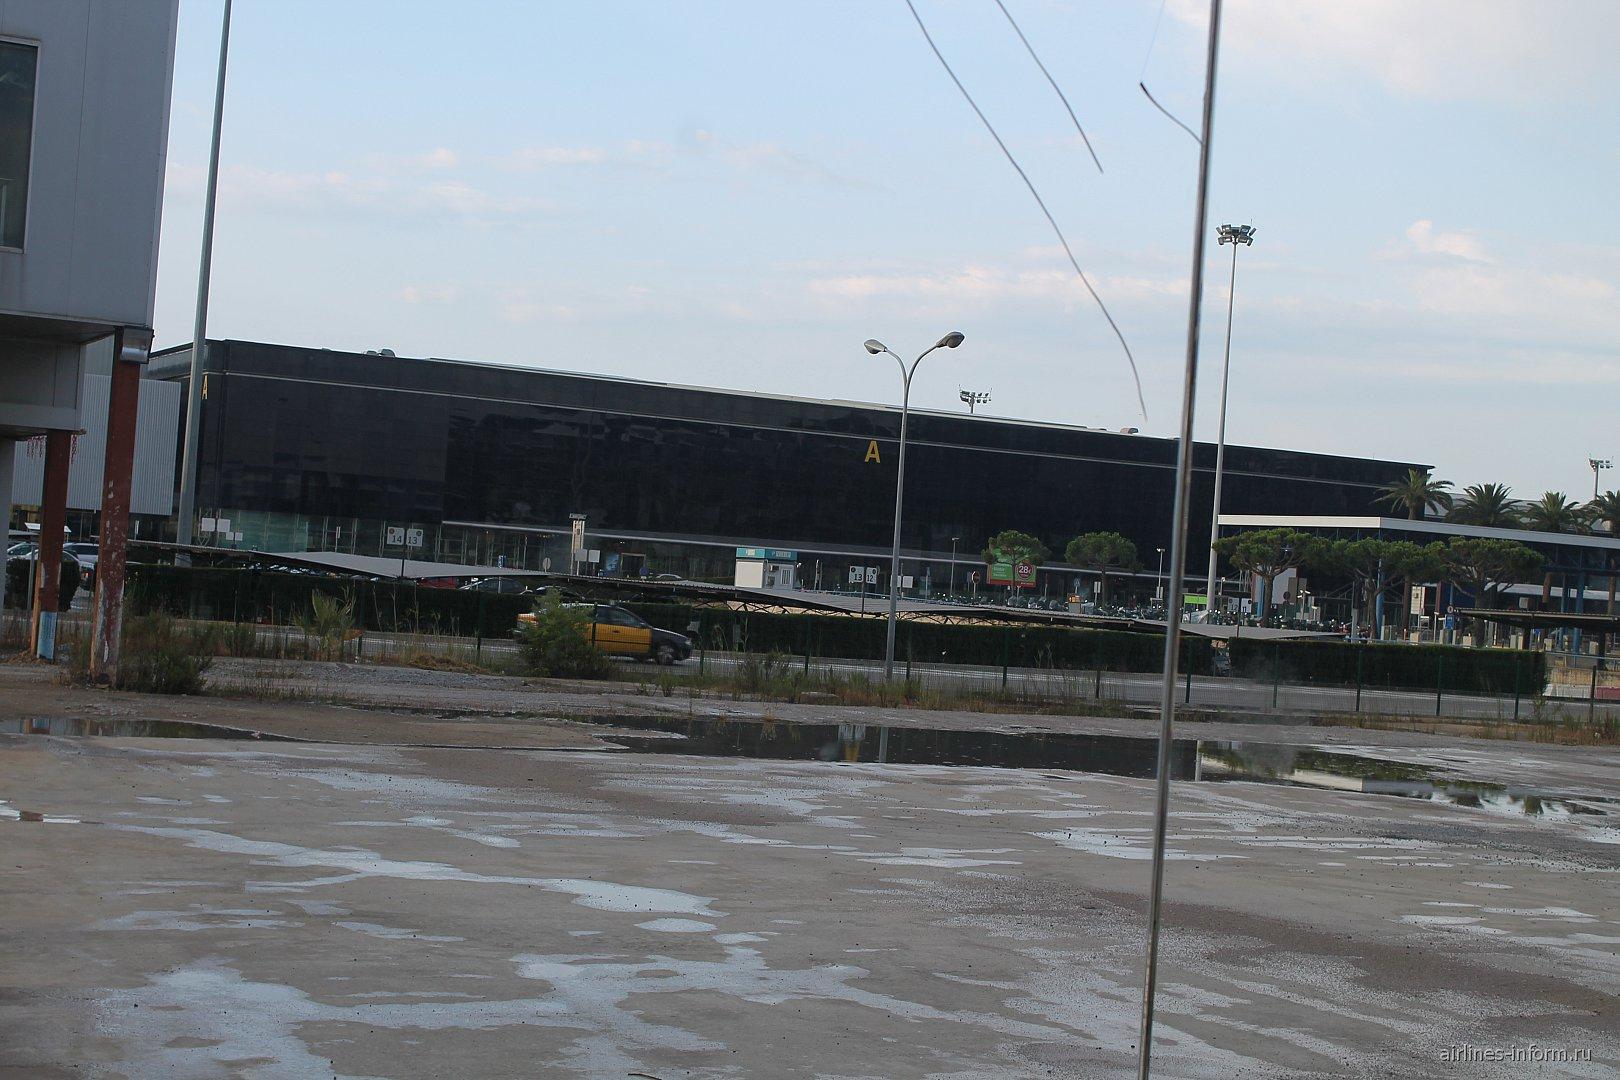 Терминала T2 А аэропорта Барселоны